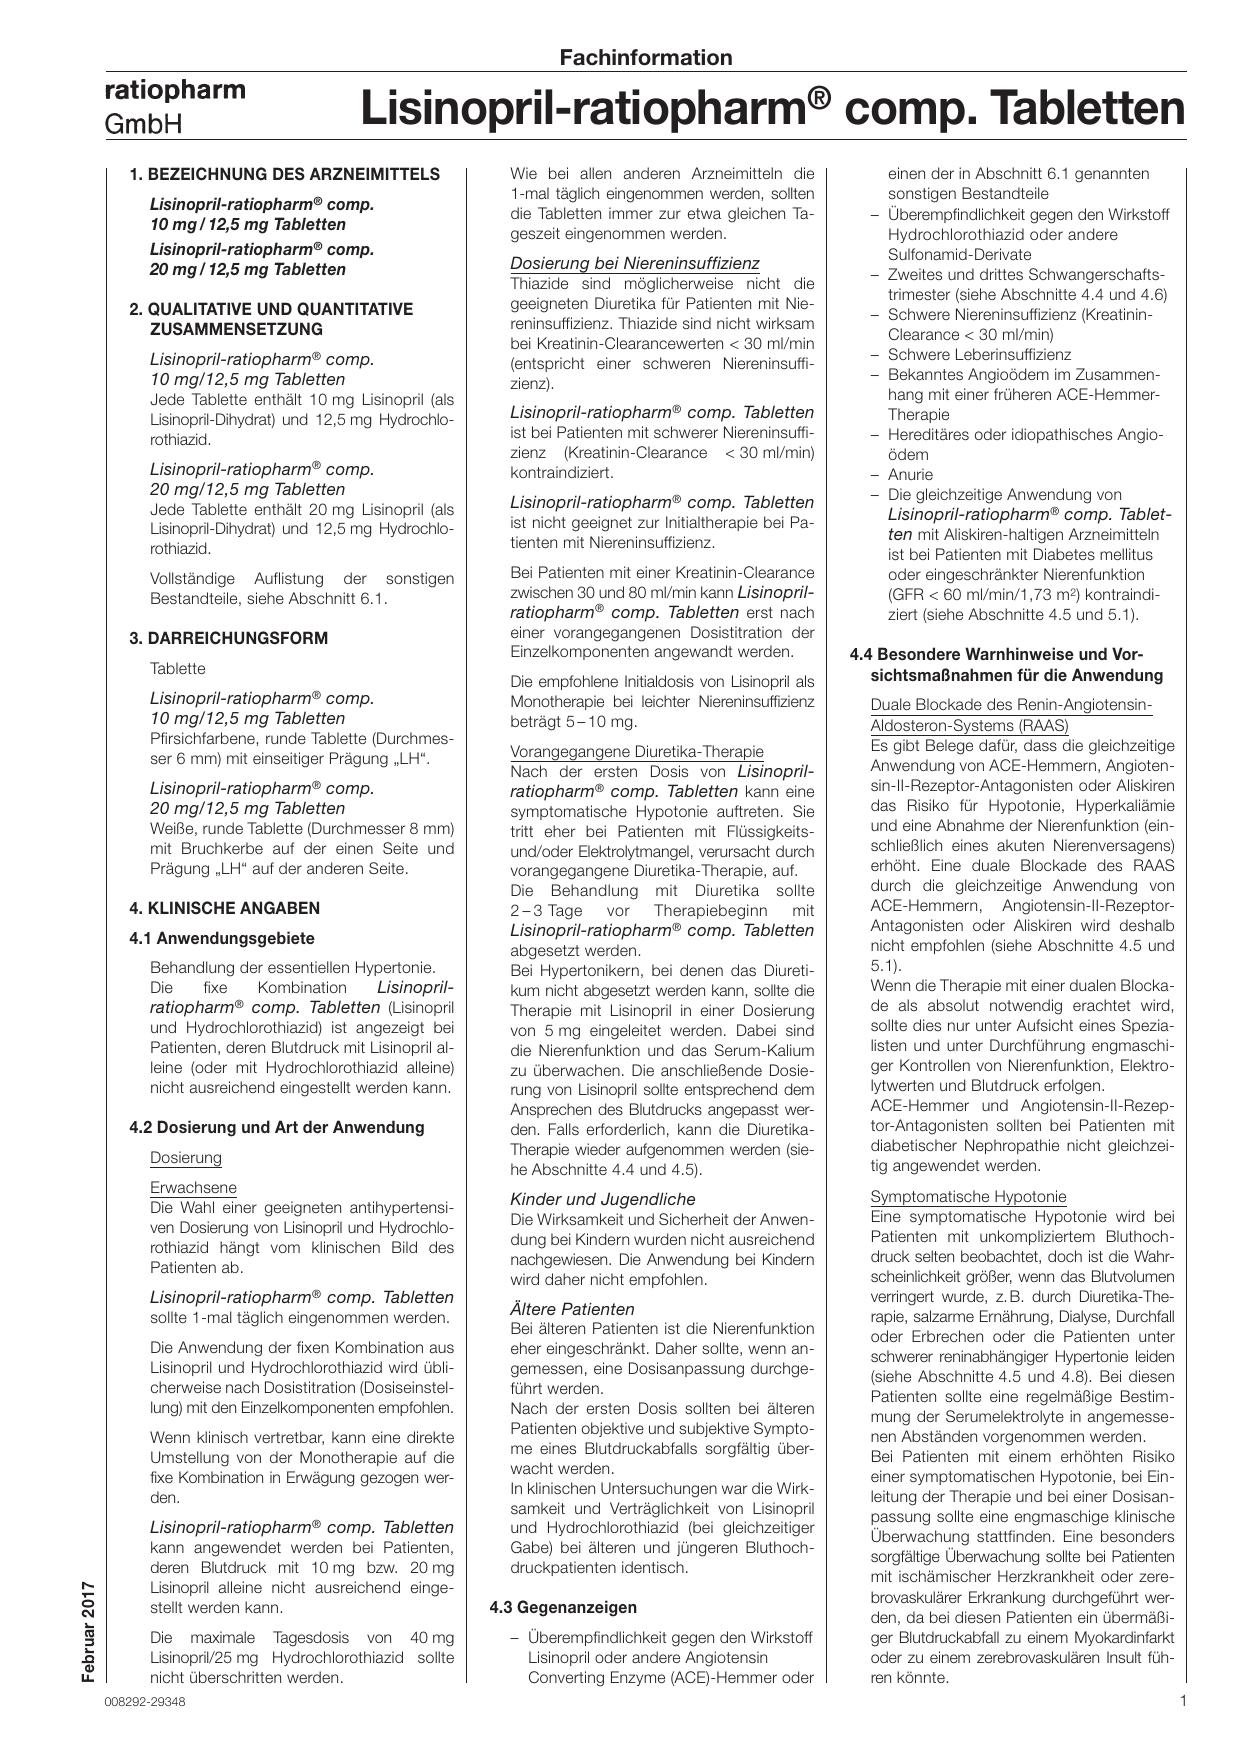 Lisinopril-ratiopharm® comp. Tabletten